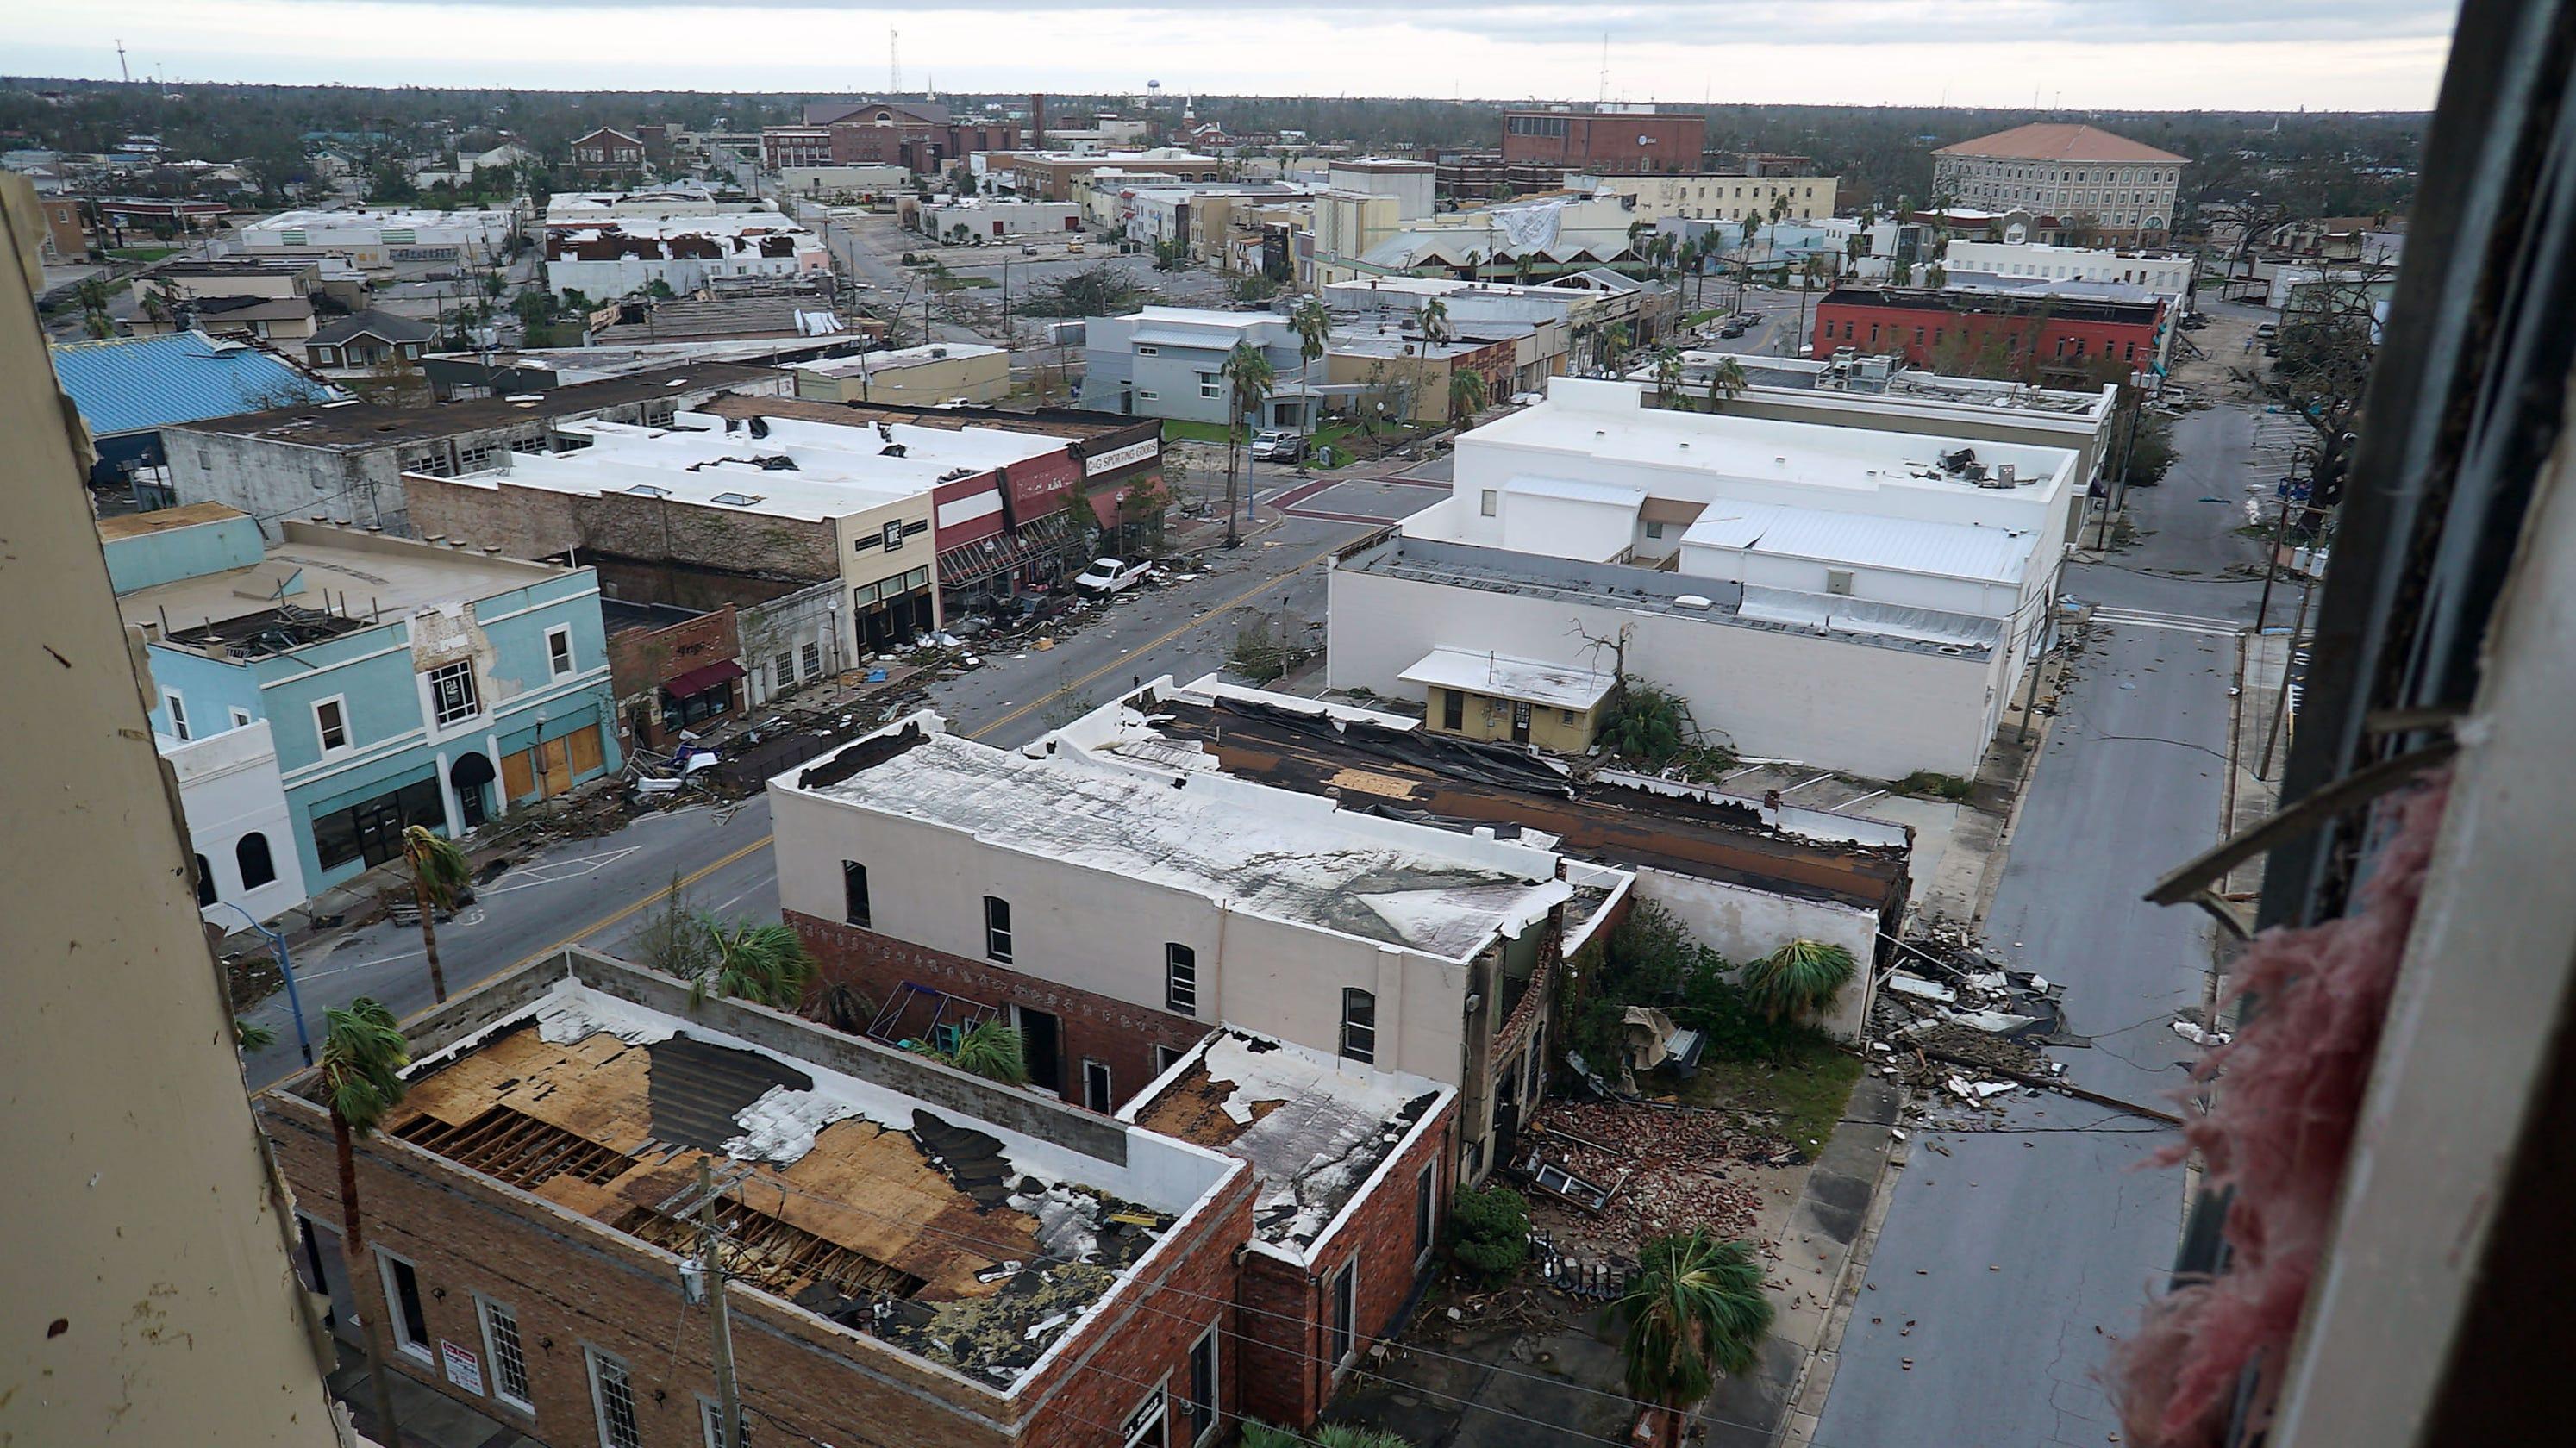 Hurricane Michael damage: Storm kills 7 as damage piles up